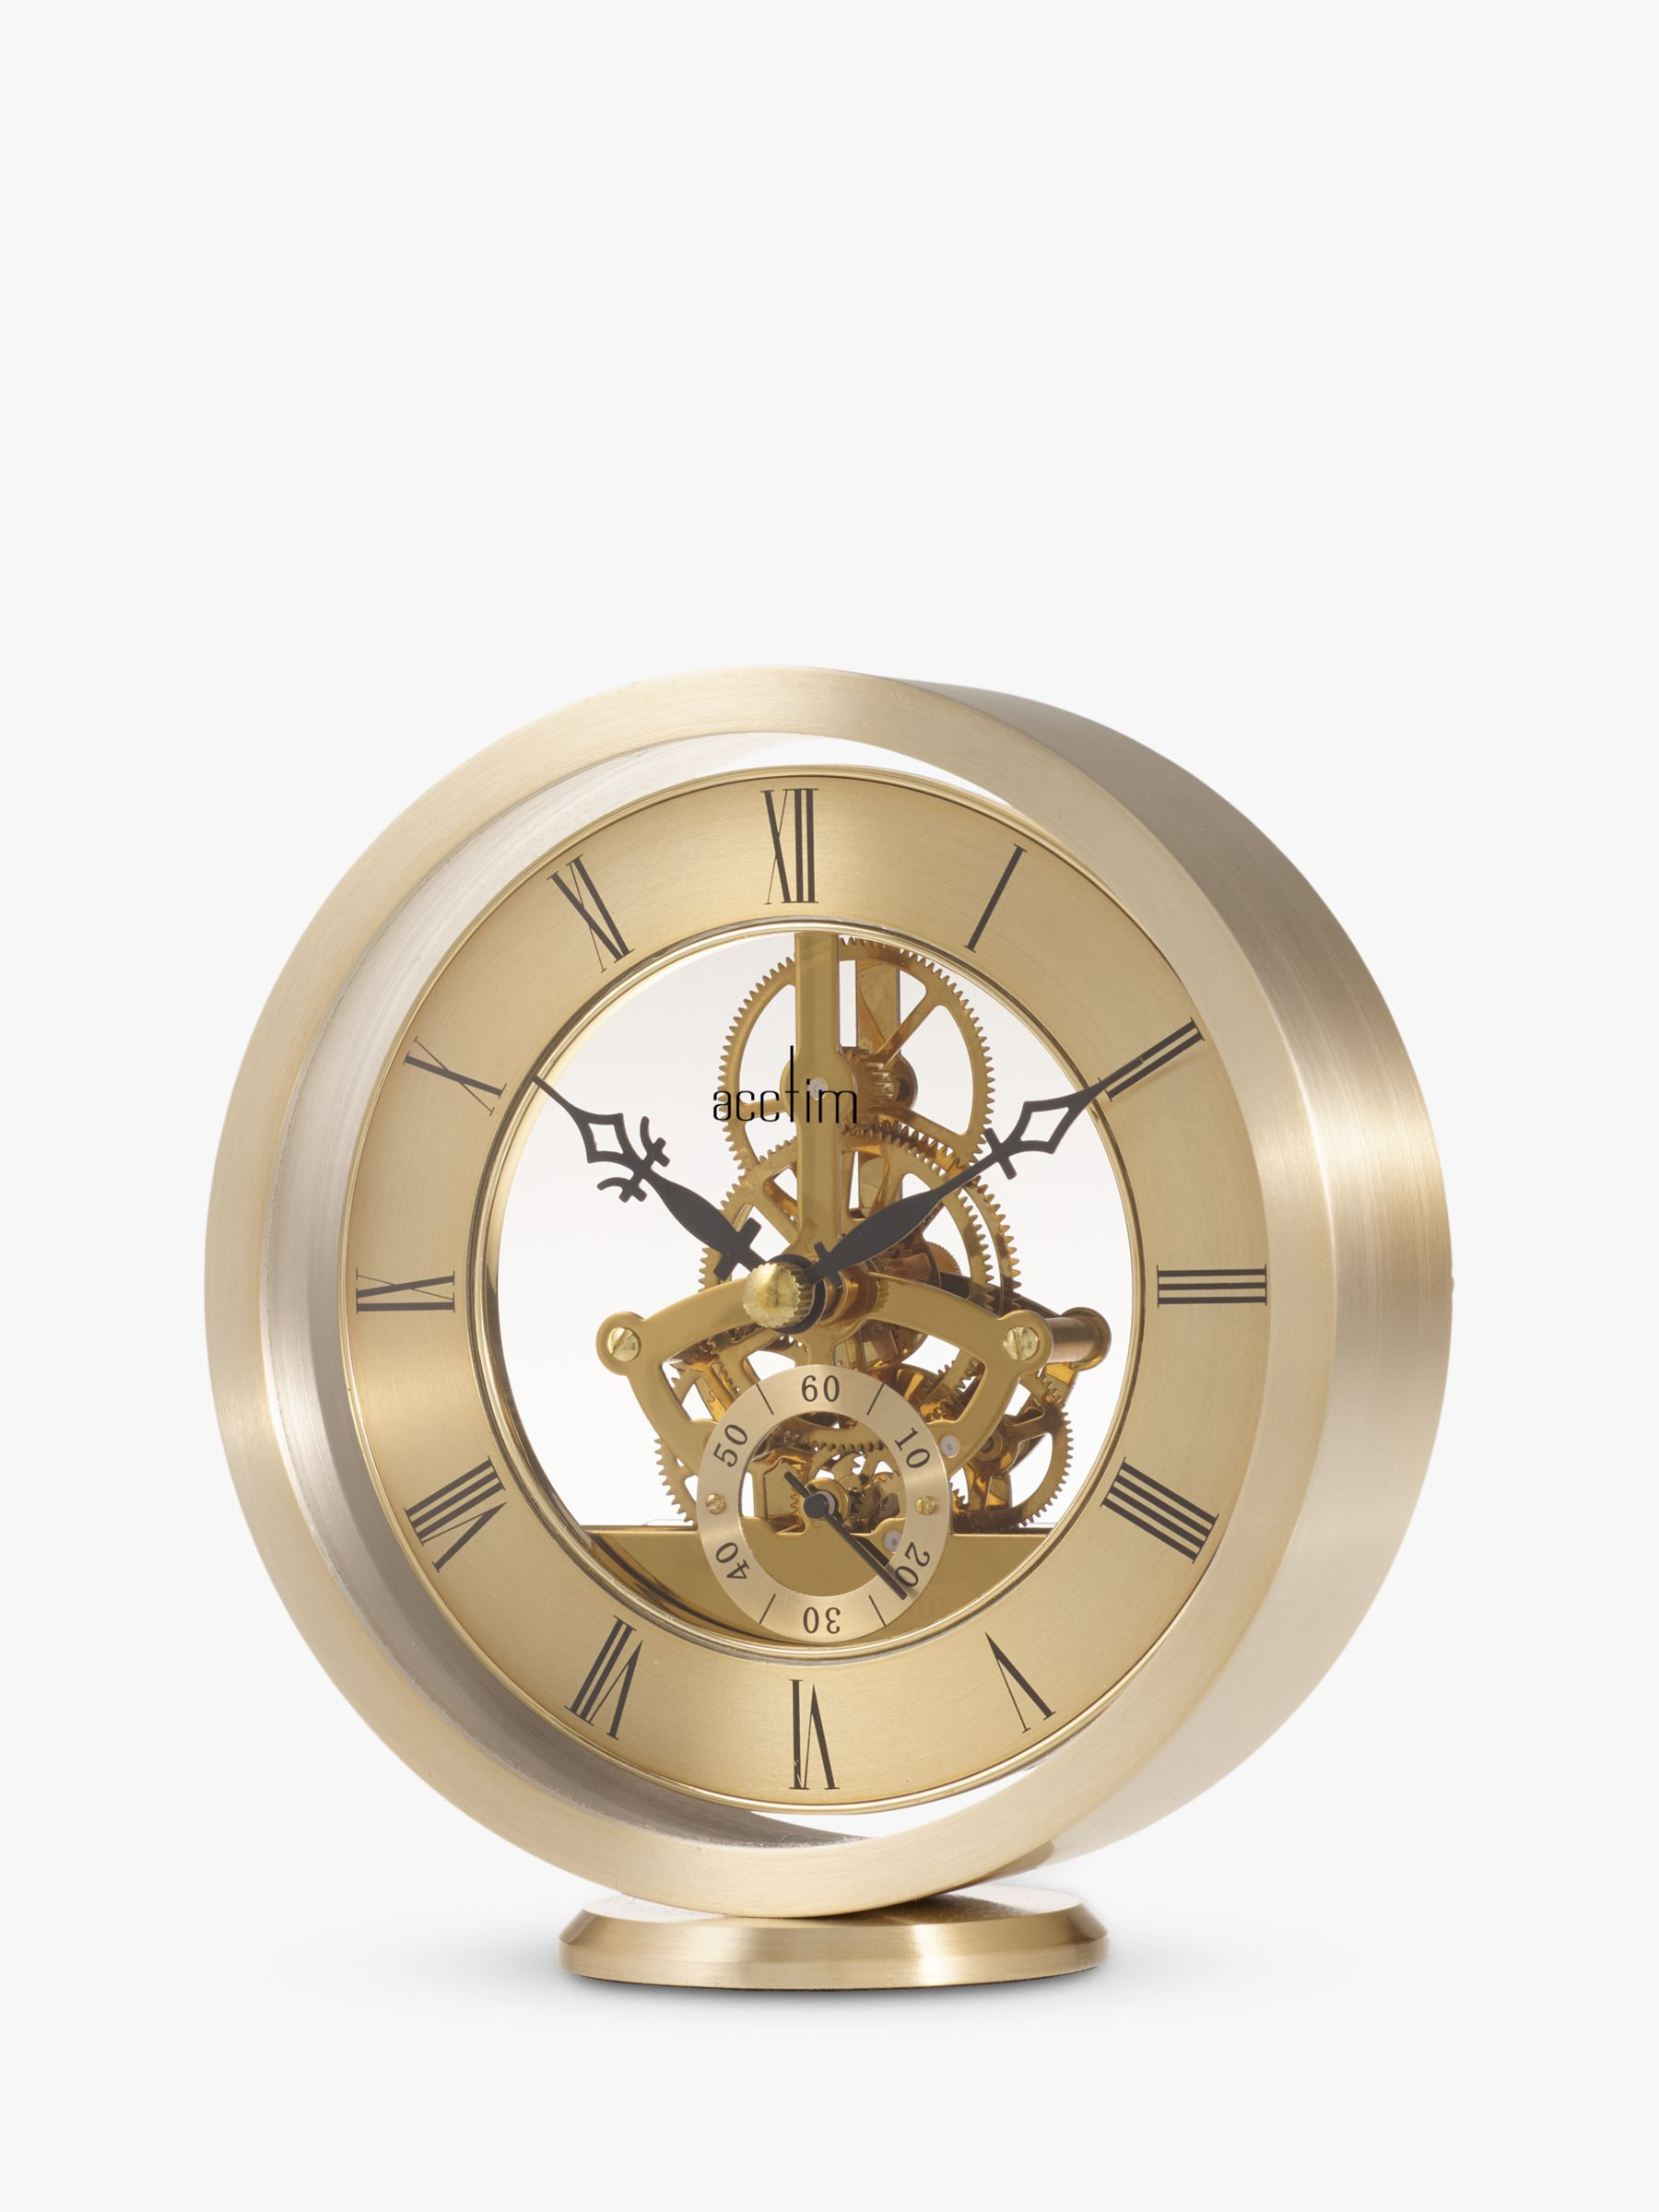 Acctim Acctim Milledon Skeleton Mantel Carriage Clock, Gold, 13cm